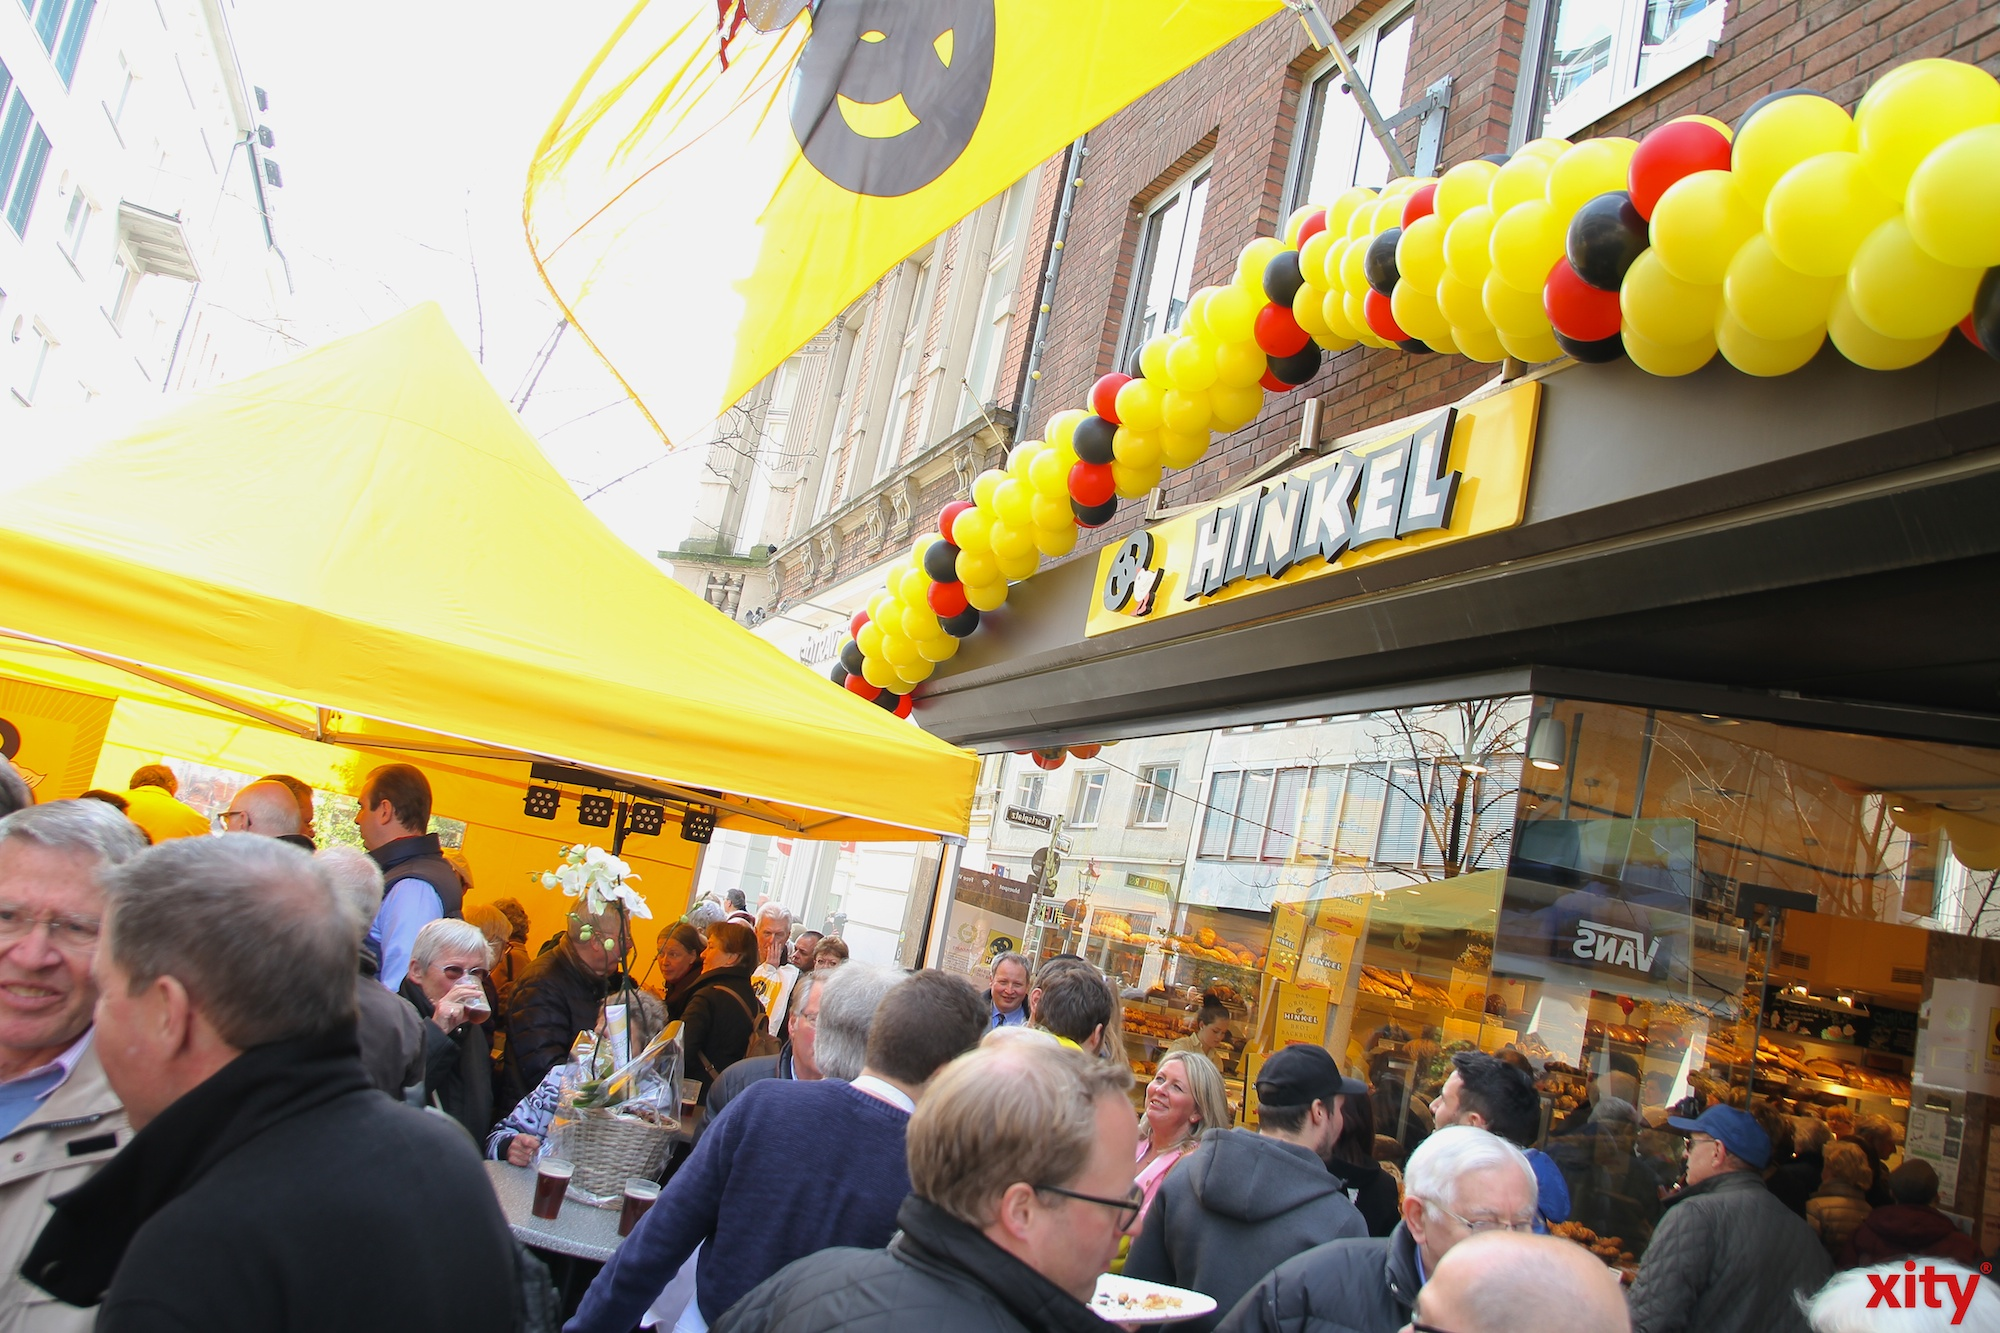 Die Bäckerei Hinkel feierte am Freitag 125 Jahre (Foto: xity)